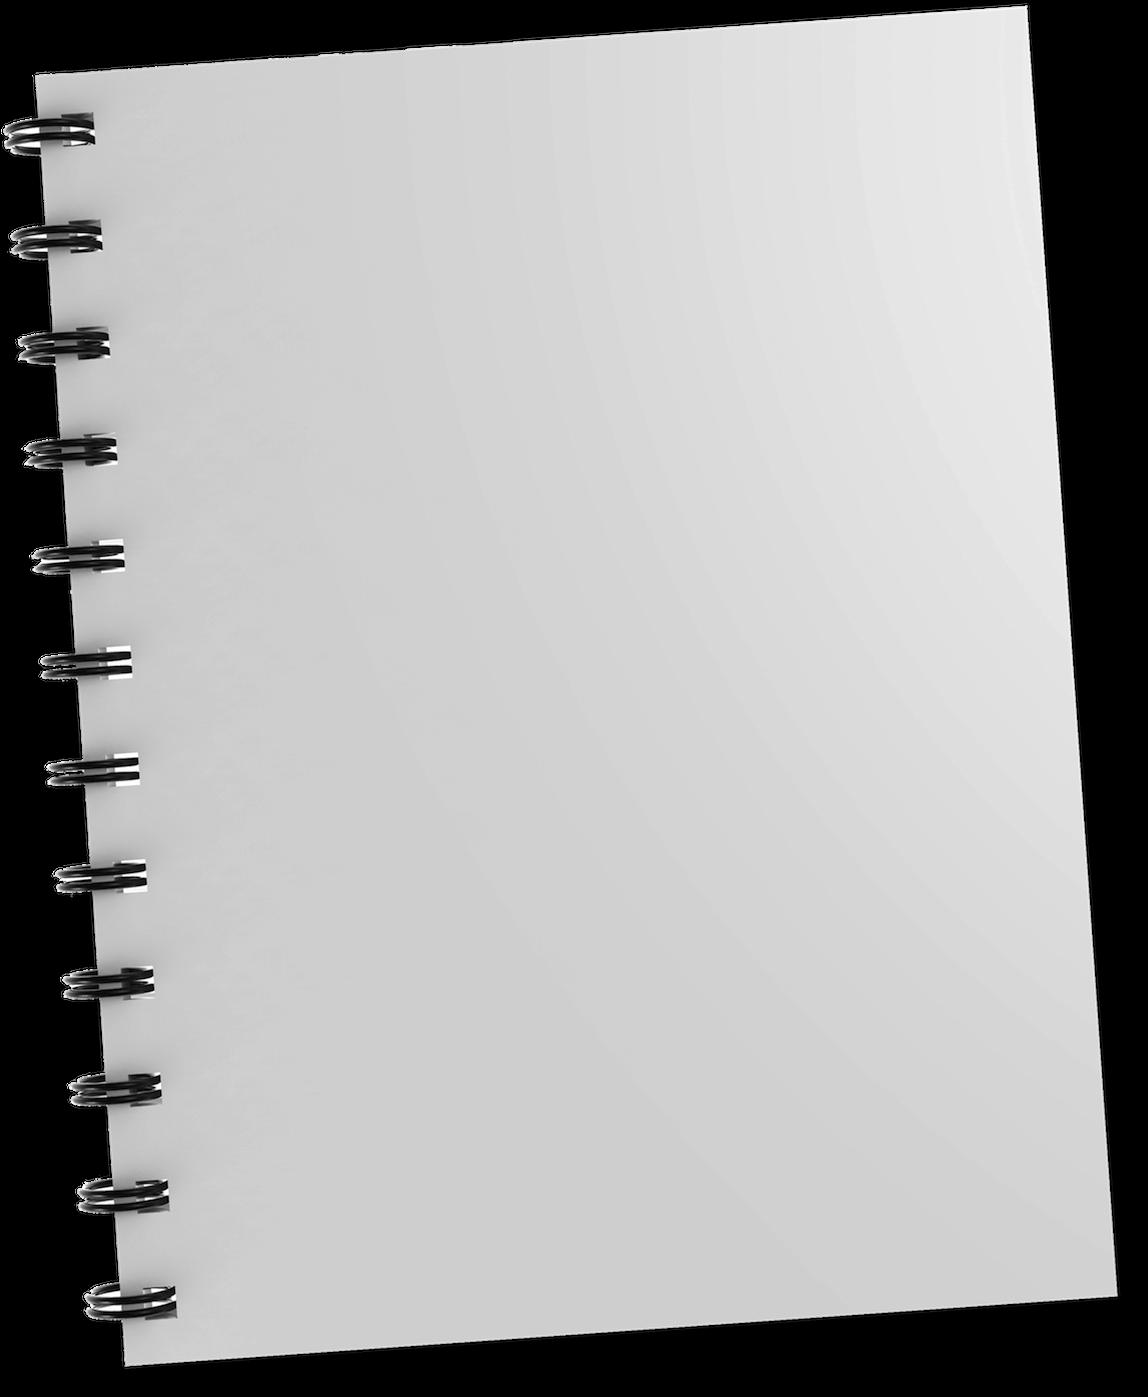 Source - Aleynikov - Me - Report - Notepad Clipart - Sketch